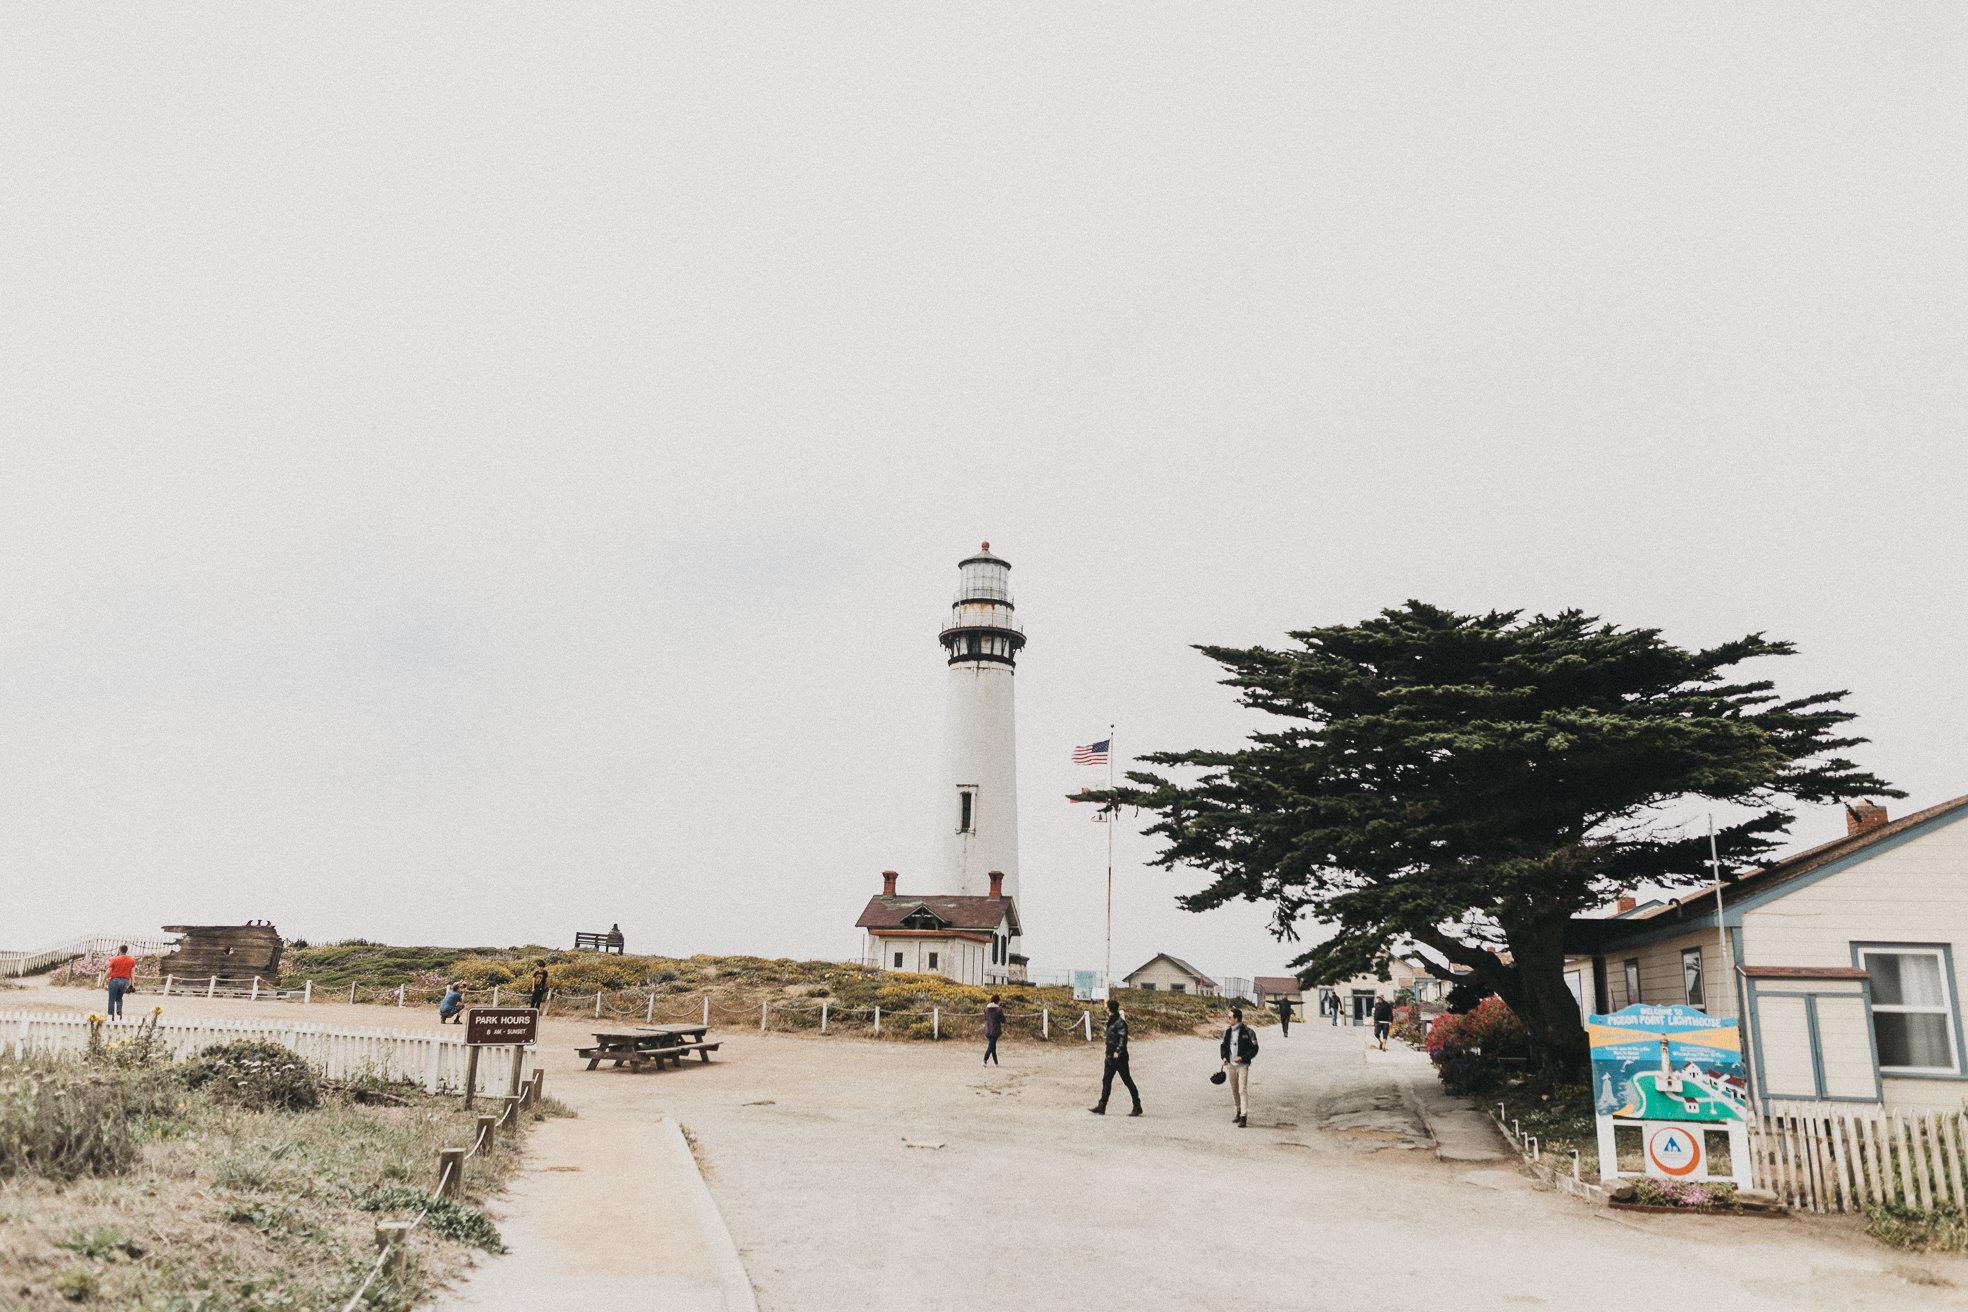 San-Francisco-BildervomLeben-9949